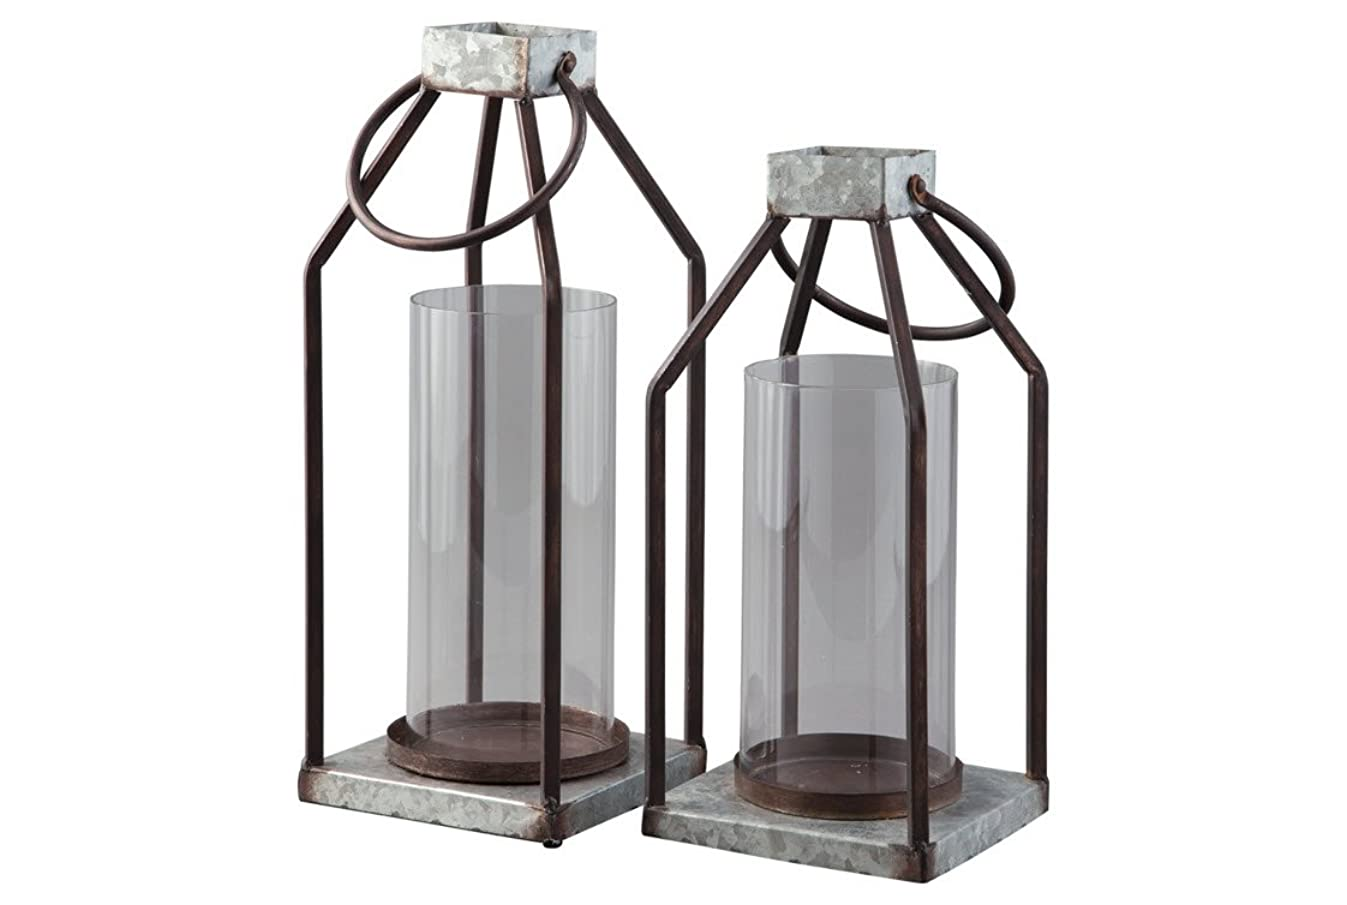 Signature Design by Ashley Diedrick Set of 2 Lanterns - Casual, Large, Gray/Black